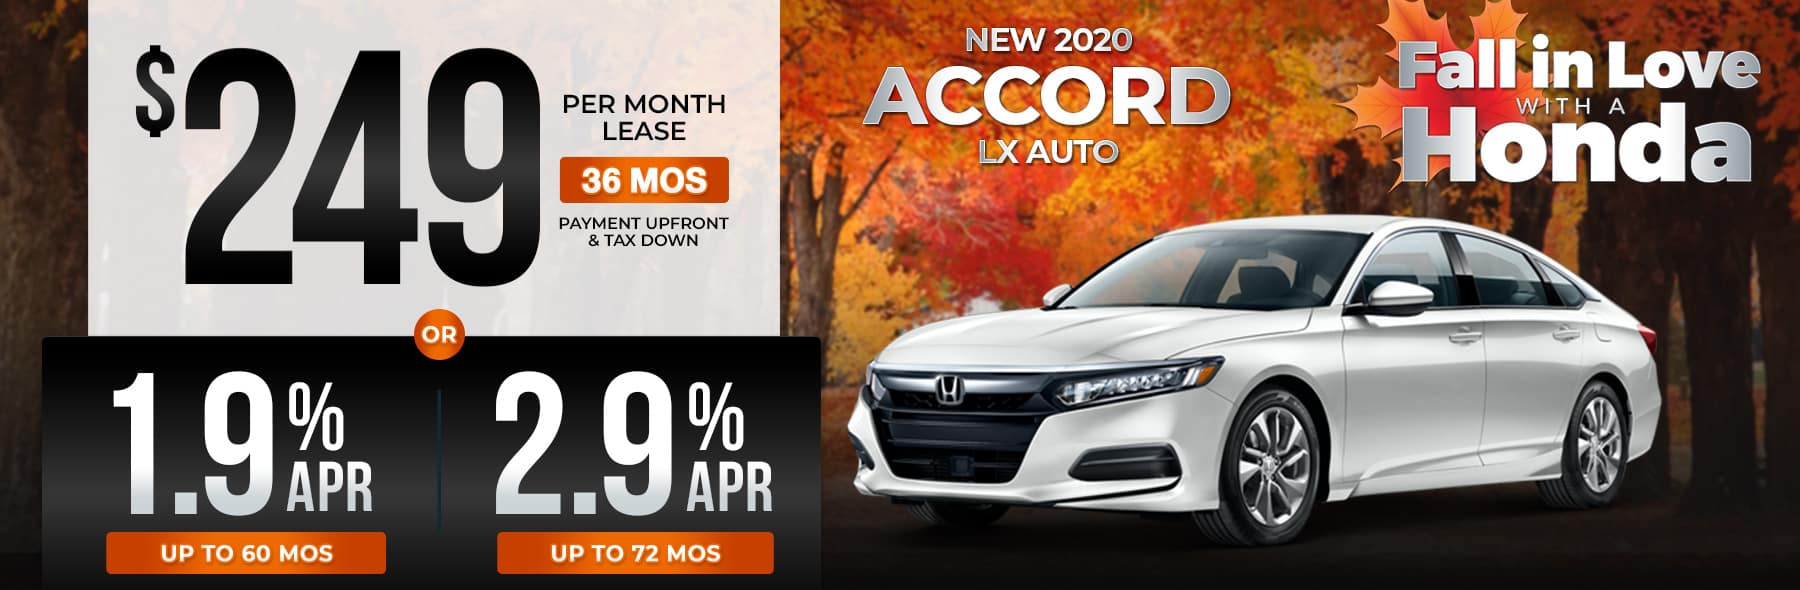 IGH-Oct20-HP-Accord-v1